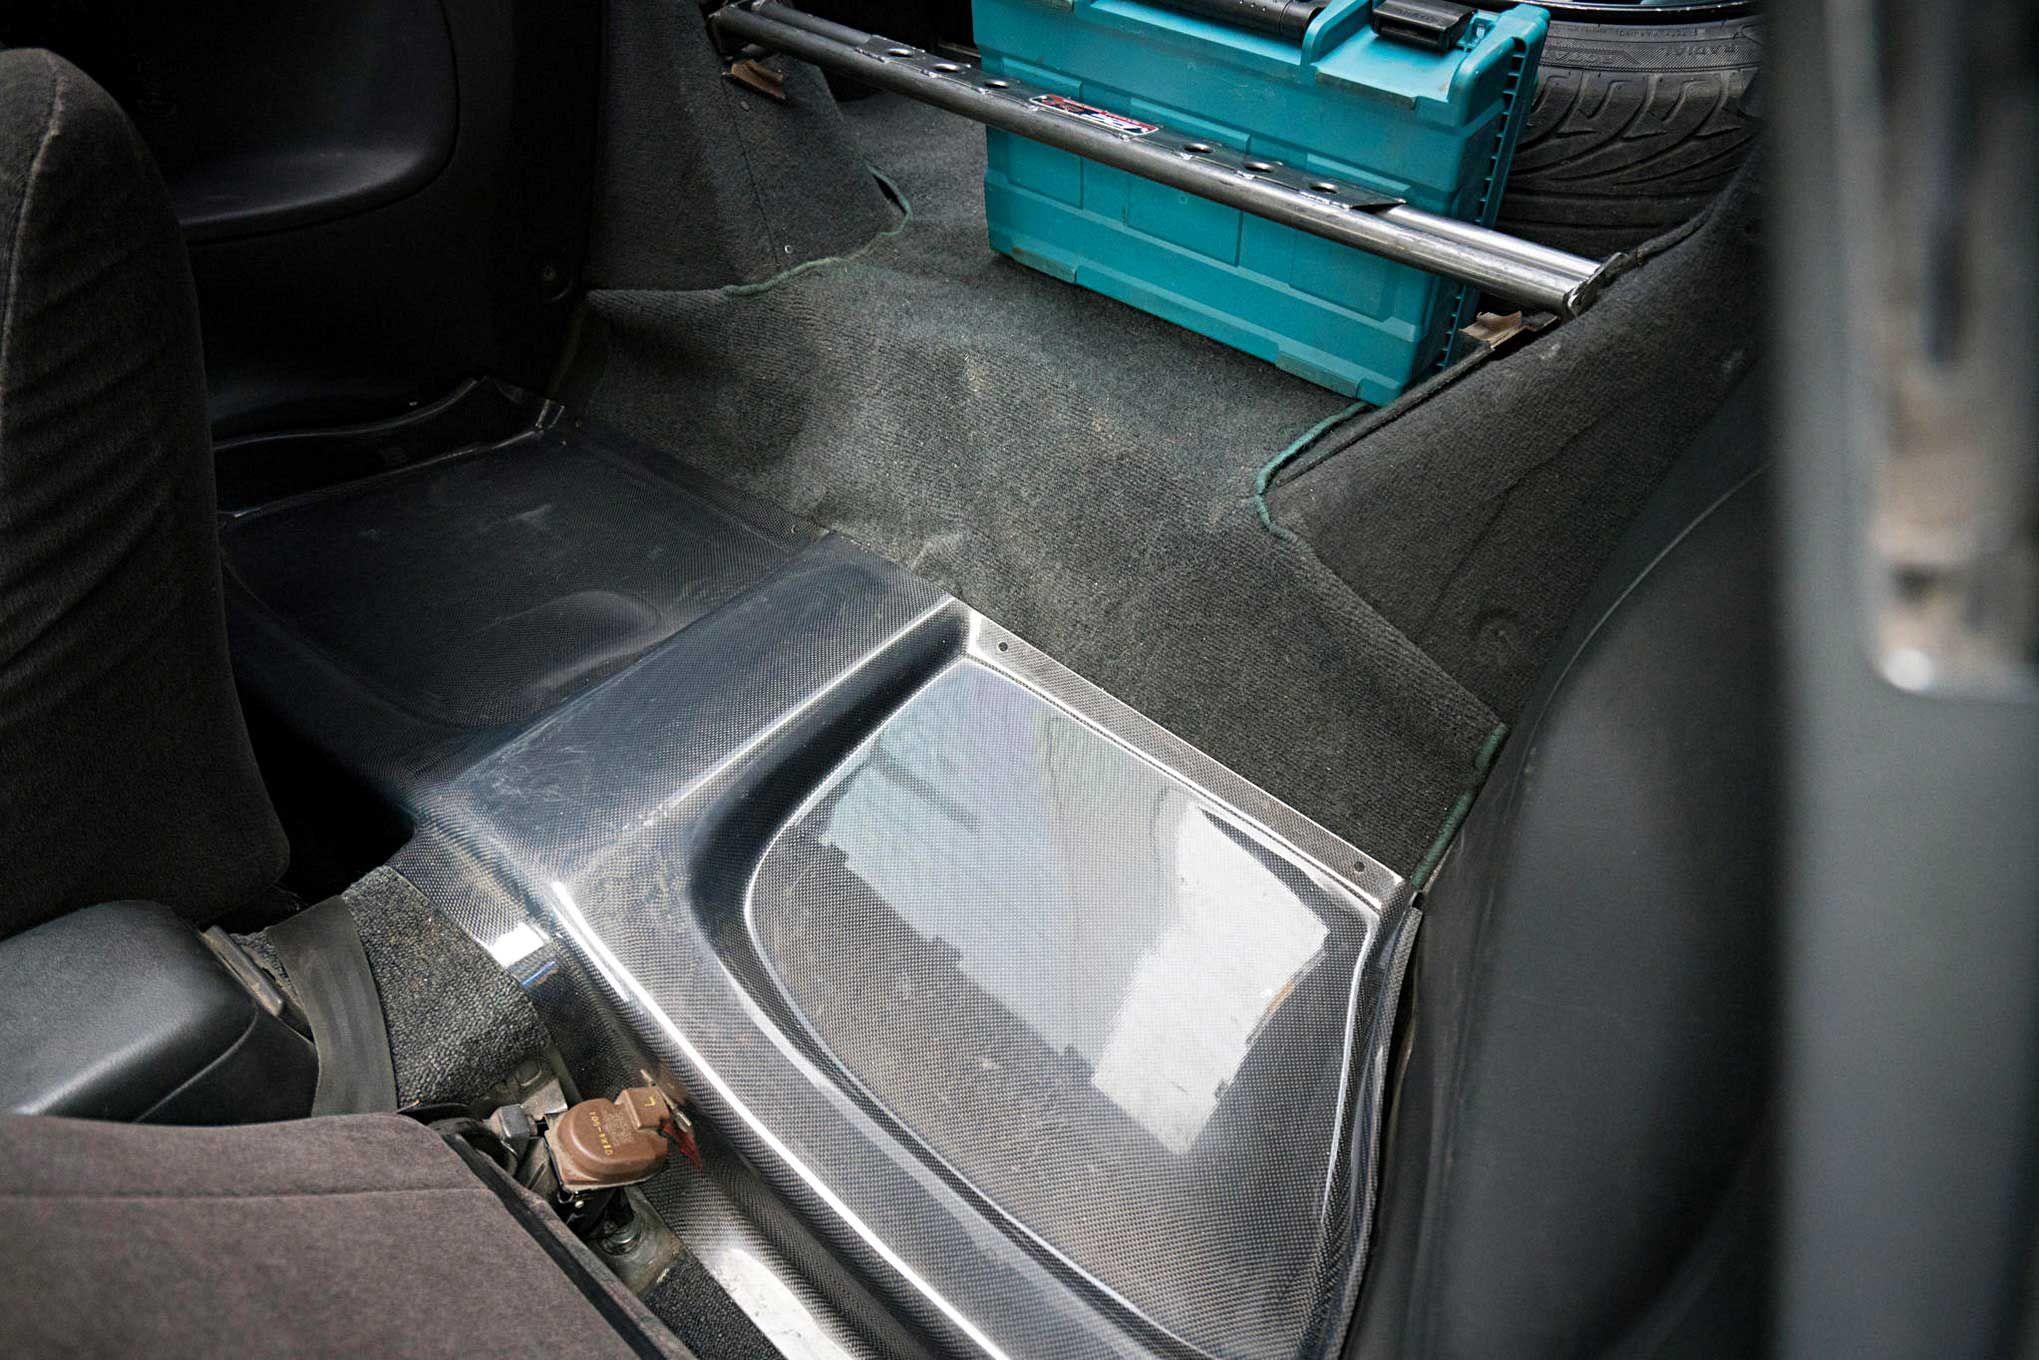 1993-nissan-240sx-origin-lab-rear-seat-delete.jpg